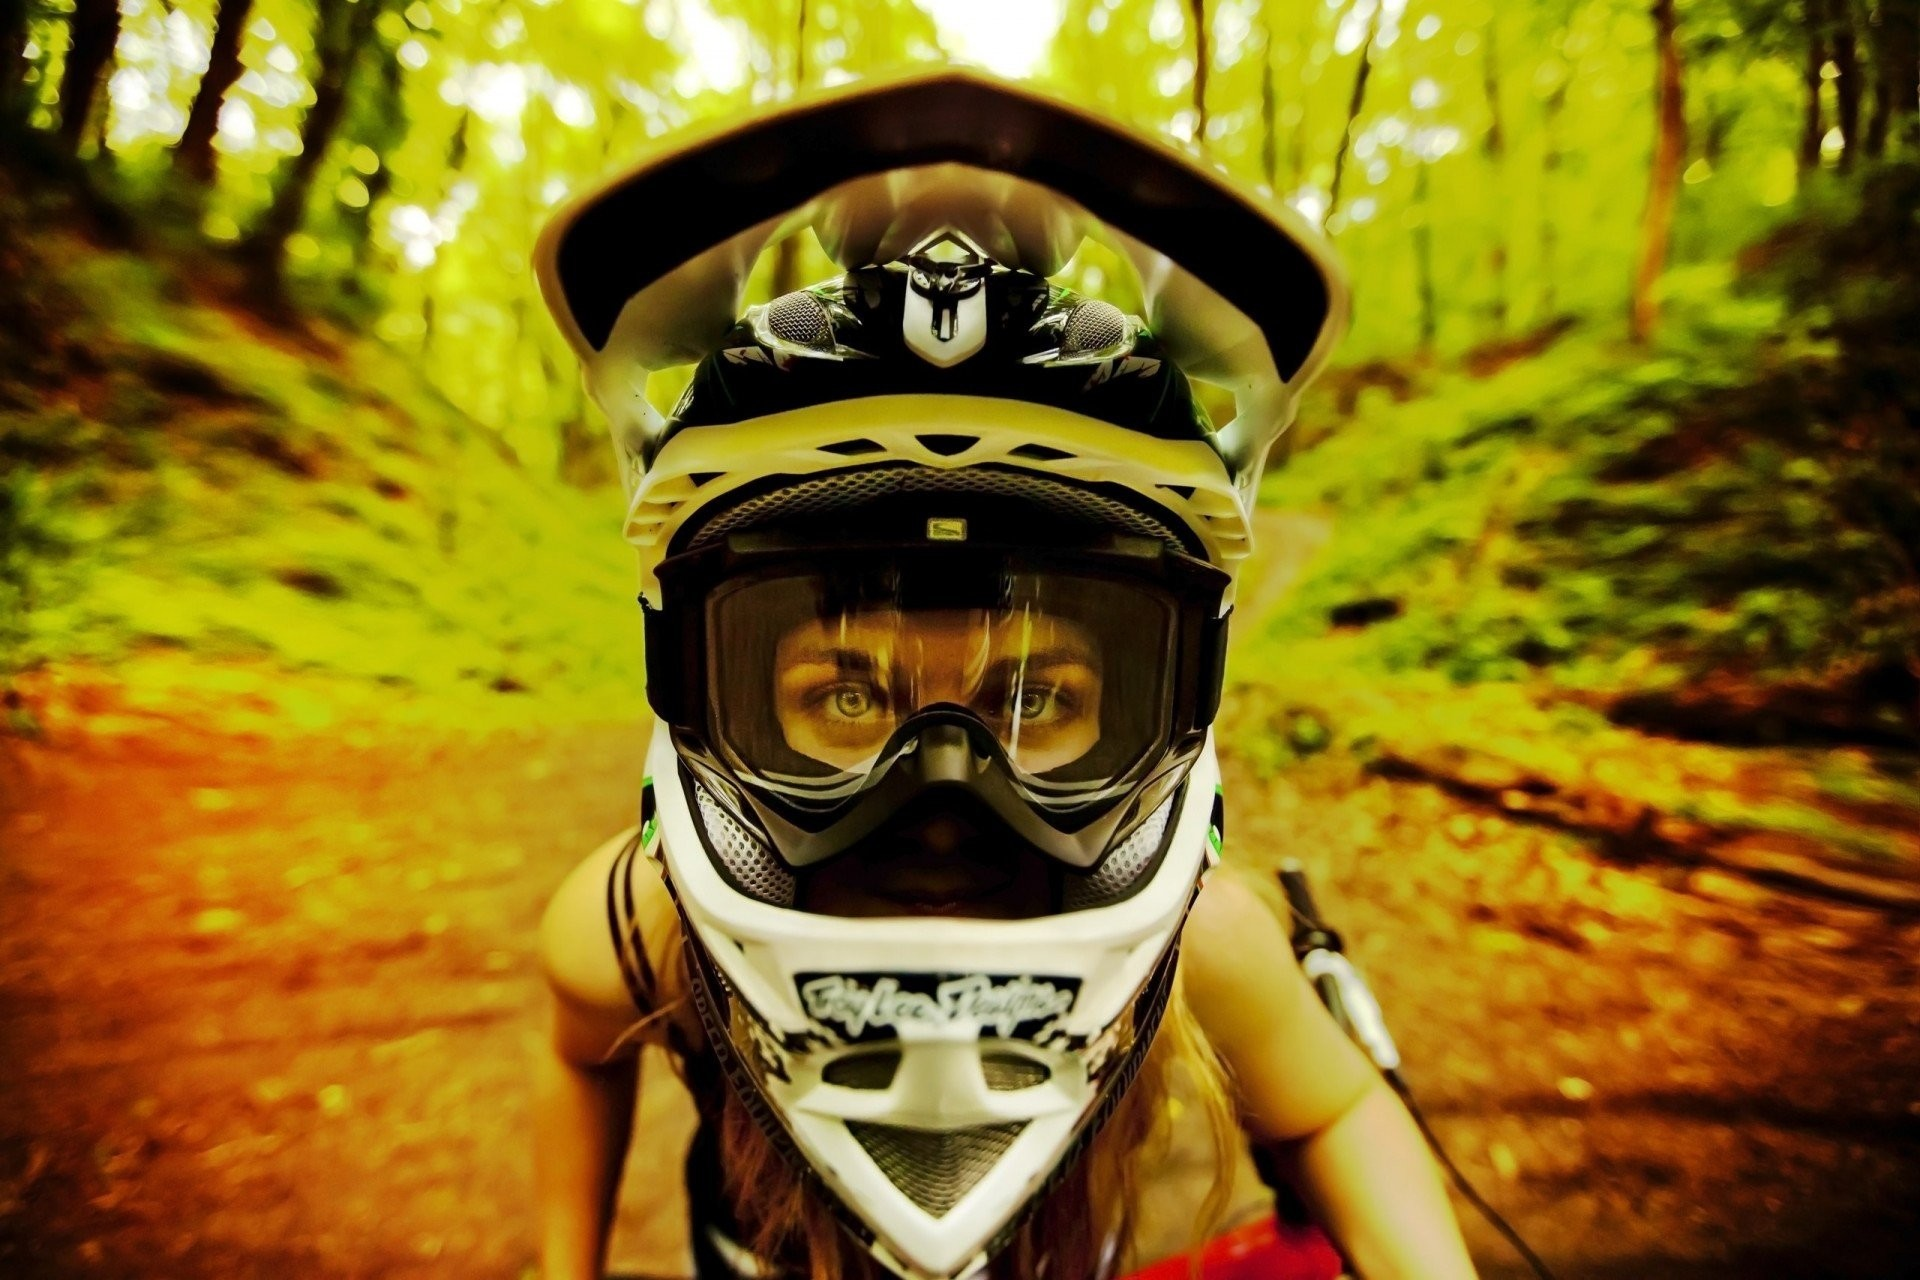 Dirt Bike Girls Wallpaper 28 Images